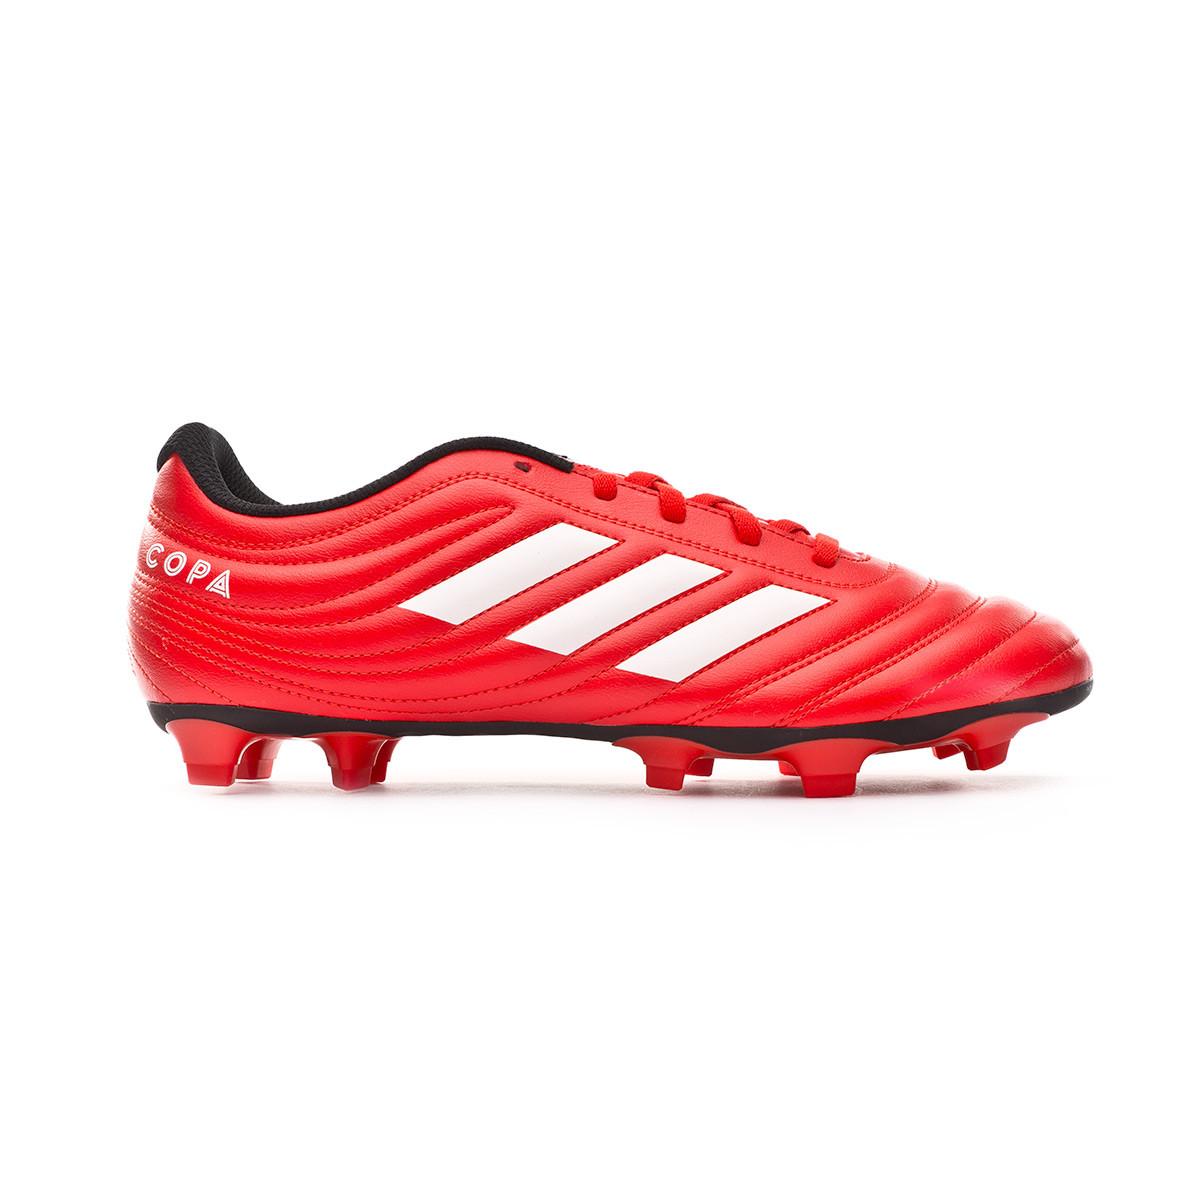 Plano Pórtico horizonte  Football Boots adidas Copa 20.4 FG Active red-White-Black - Football store  Fútbol Emotion